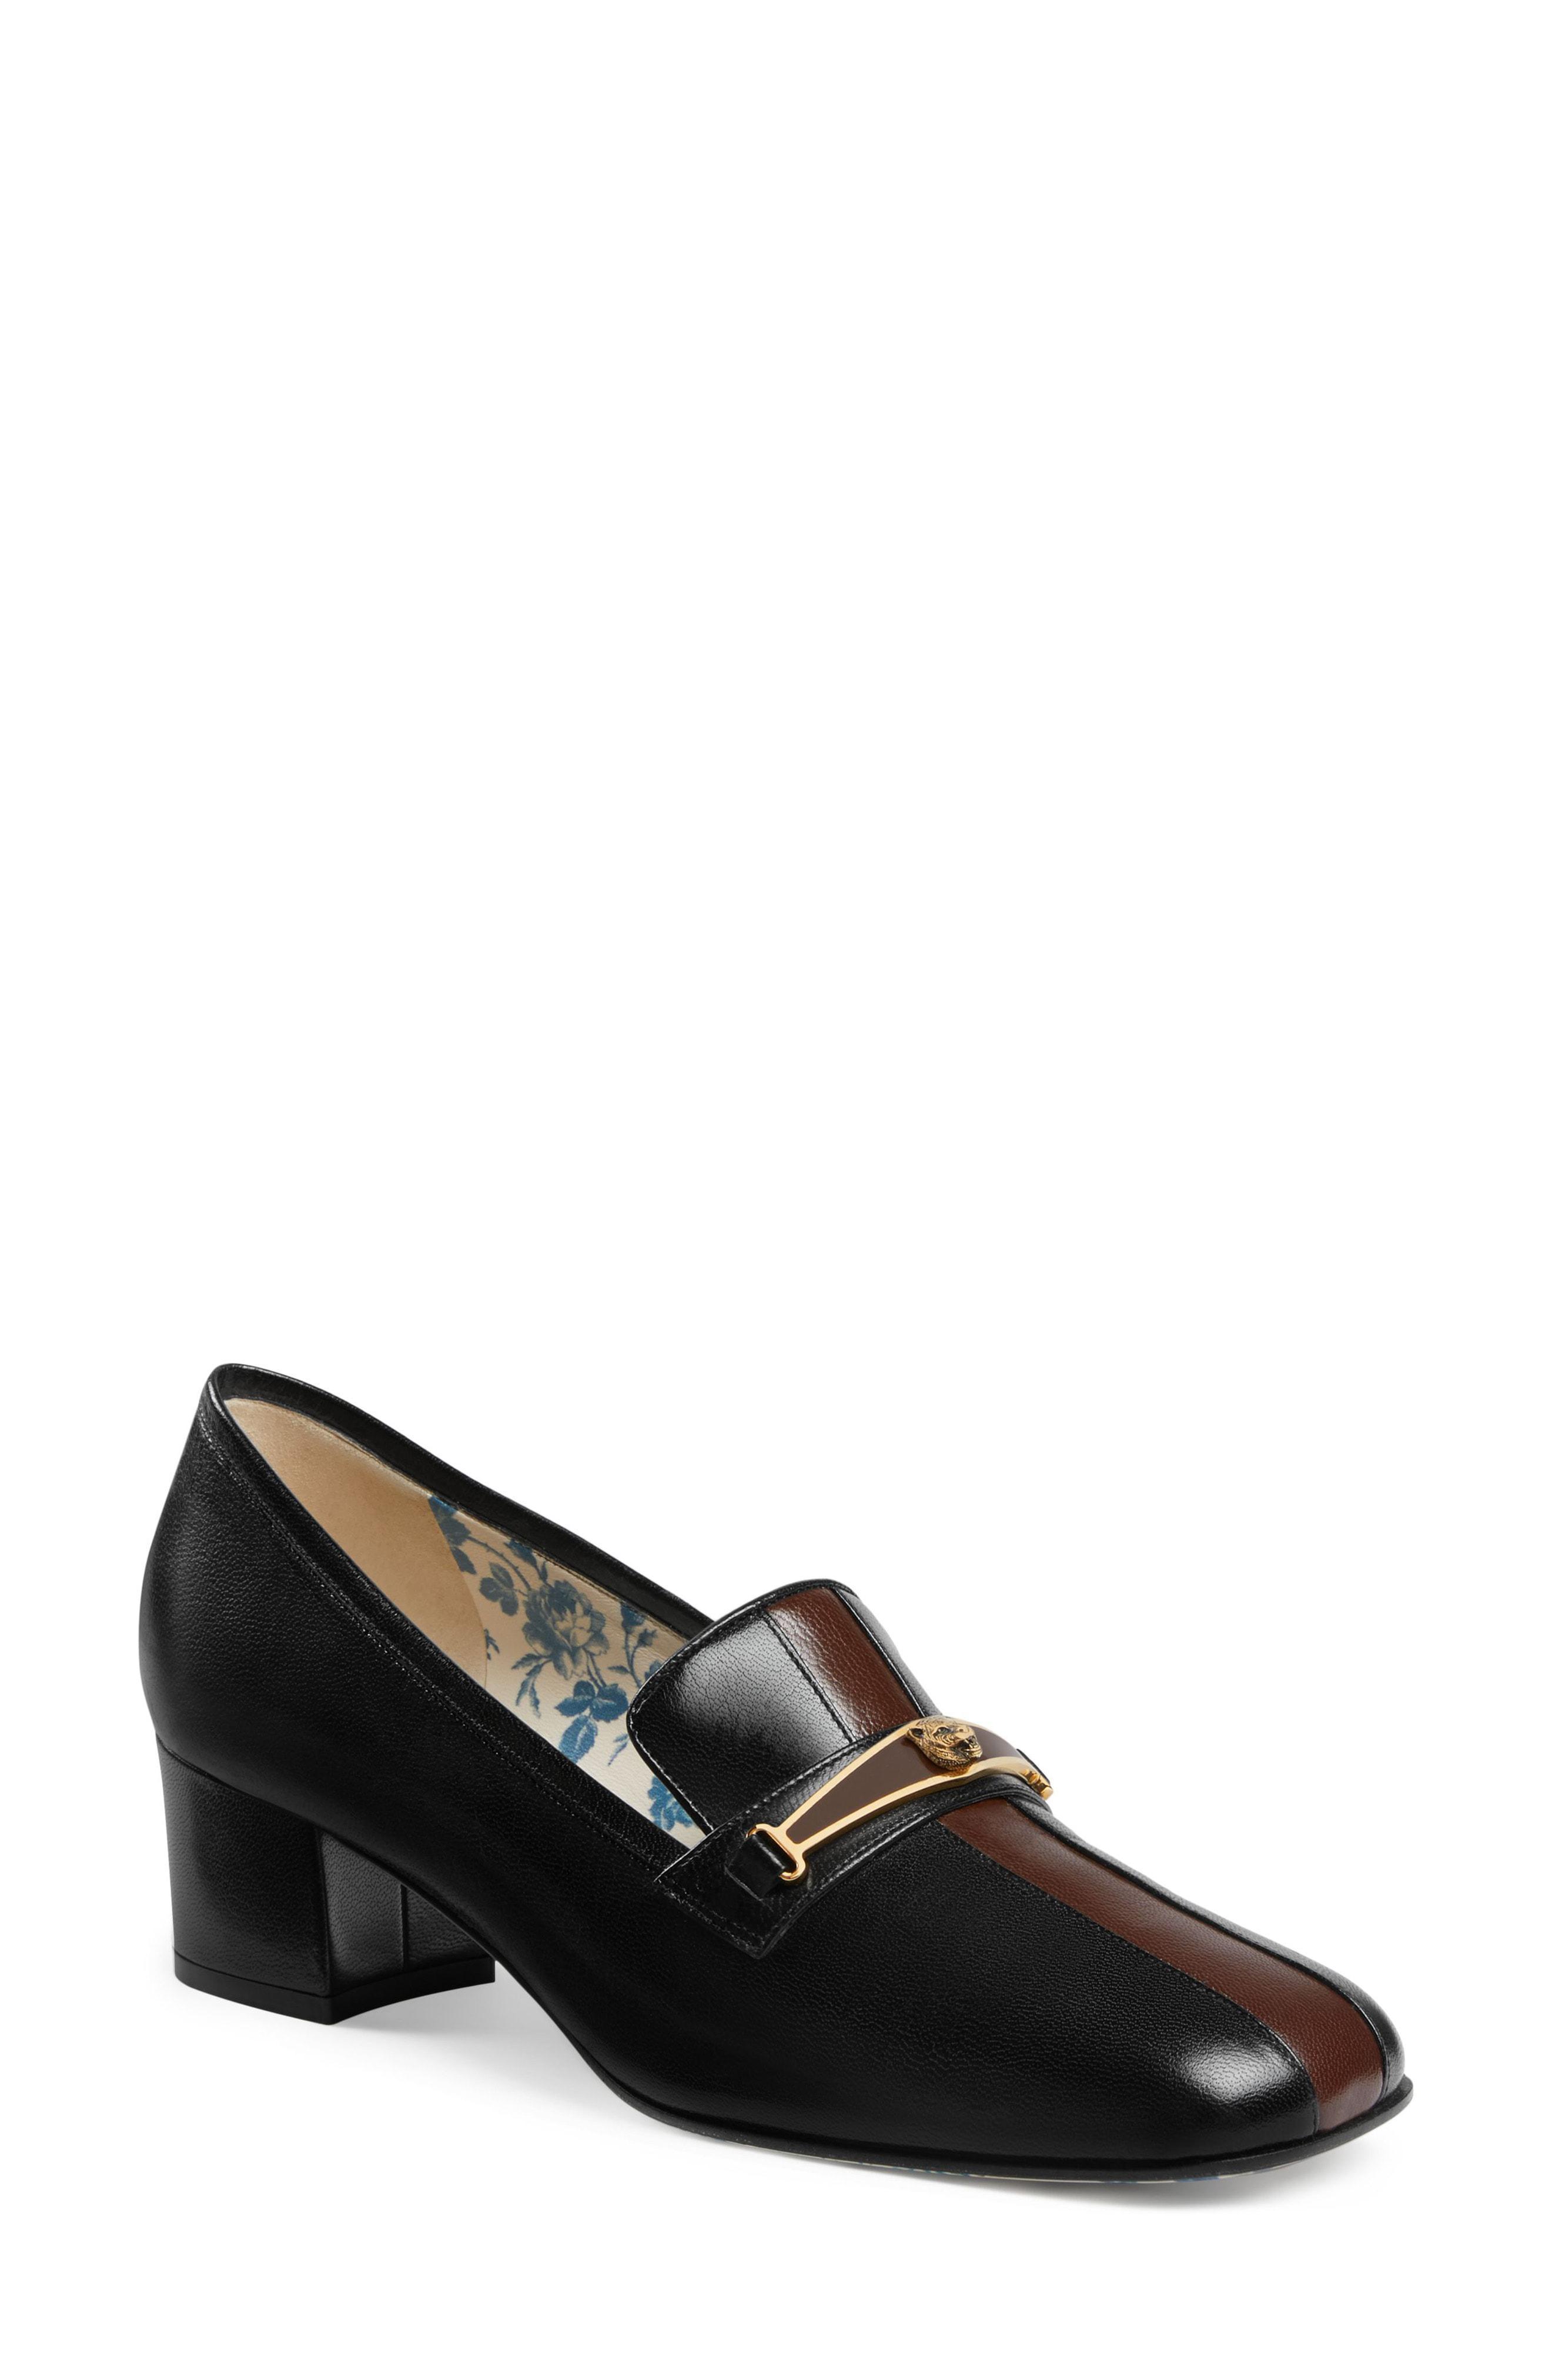 653f1d2abaf Lyst - Gucci Loafer Pump in Black